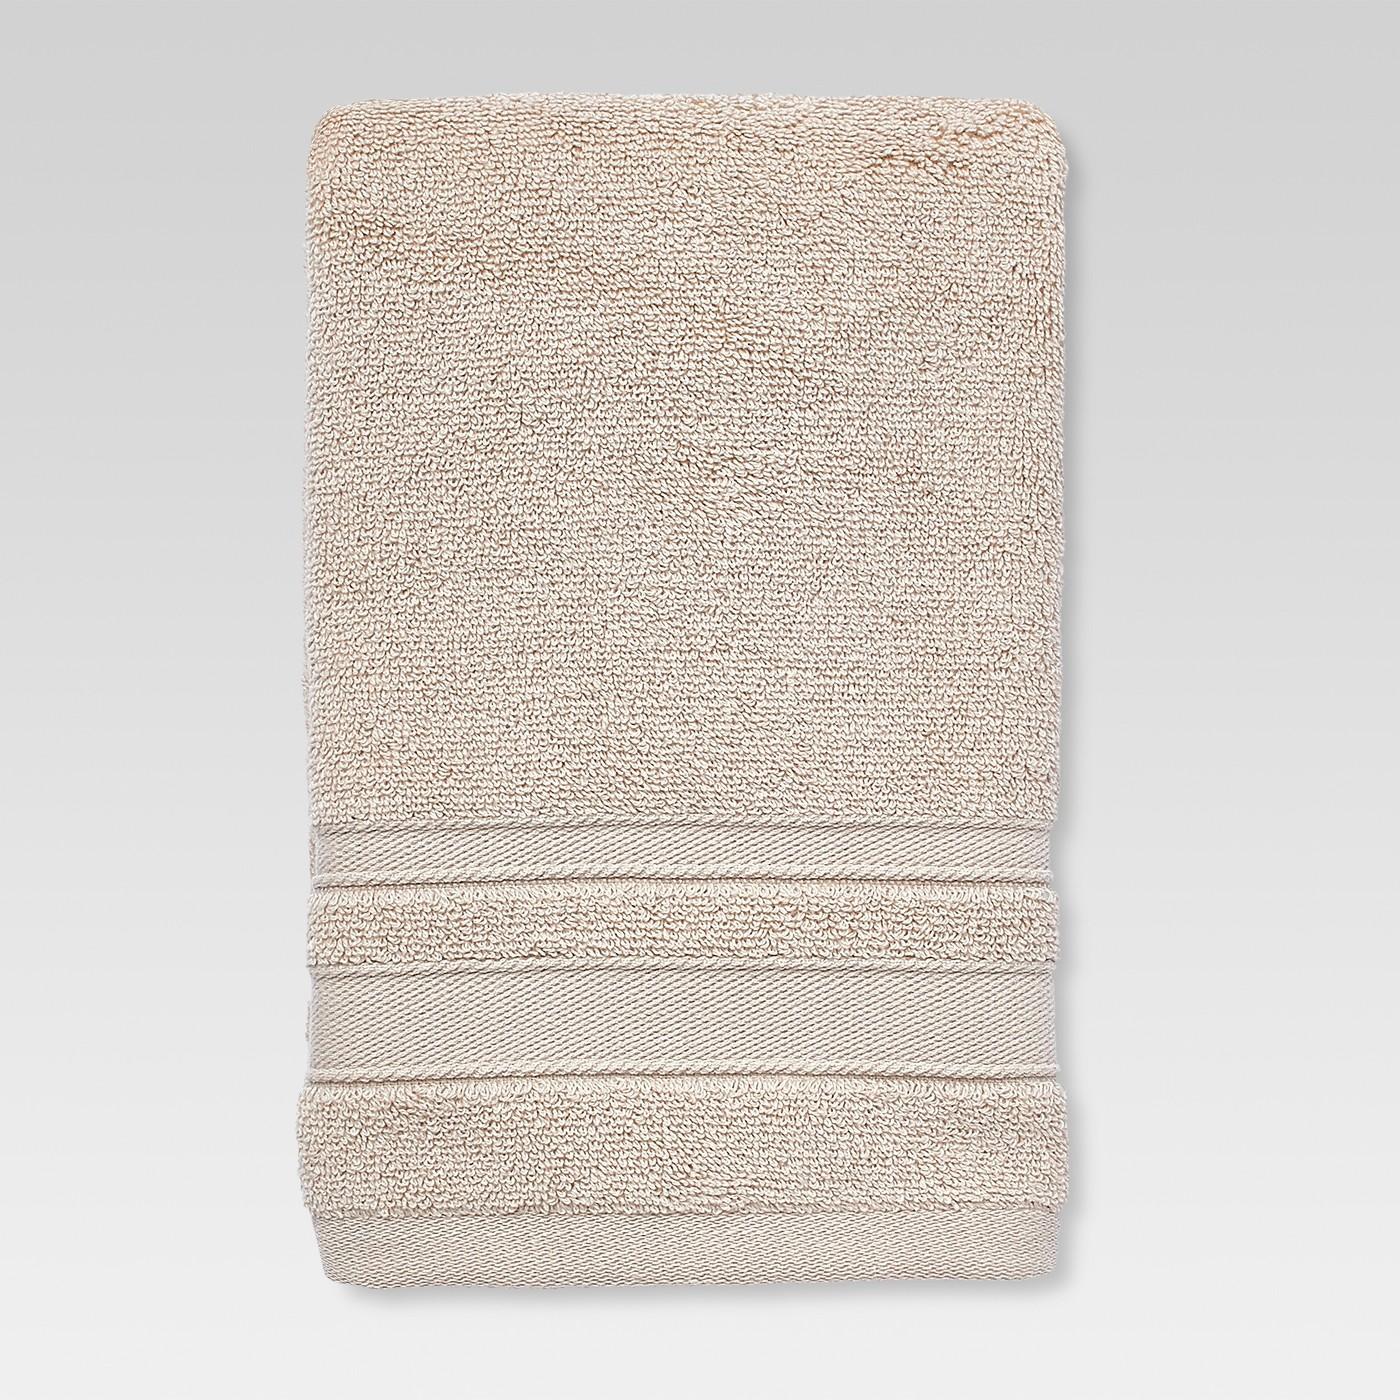 Performance Solid Bath Towel Sets - Threshold